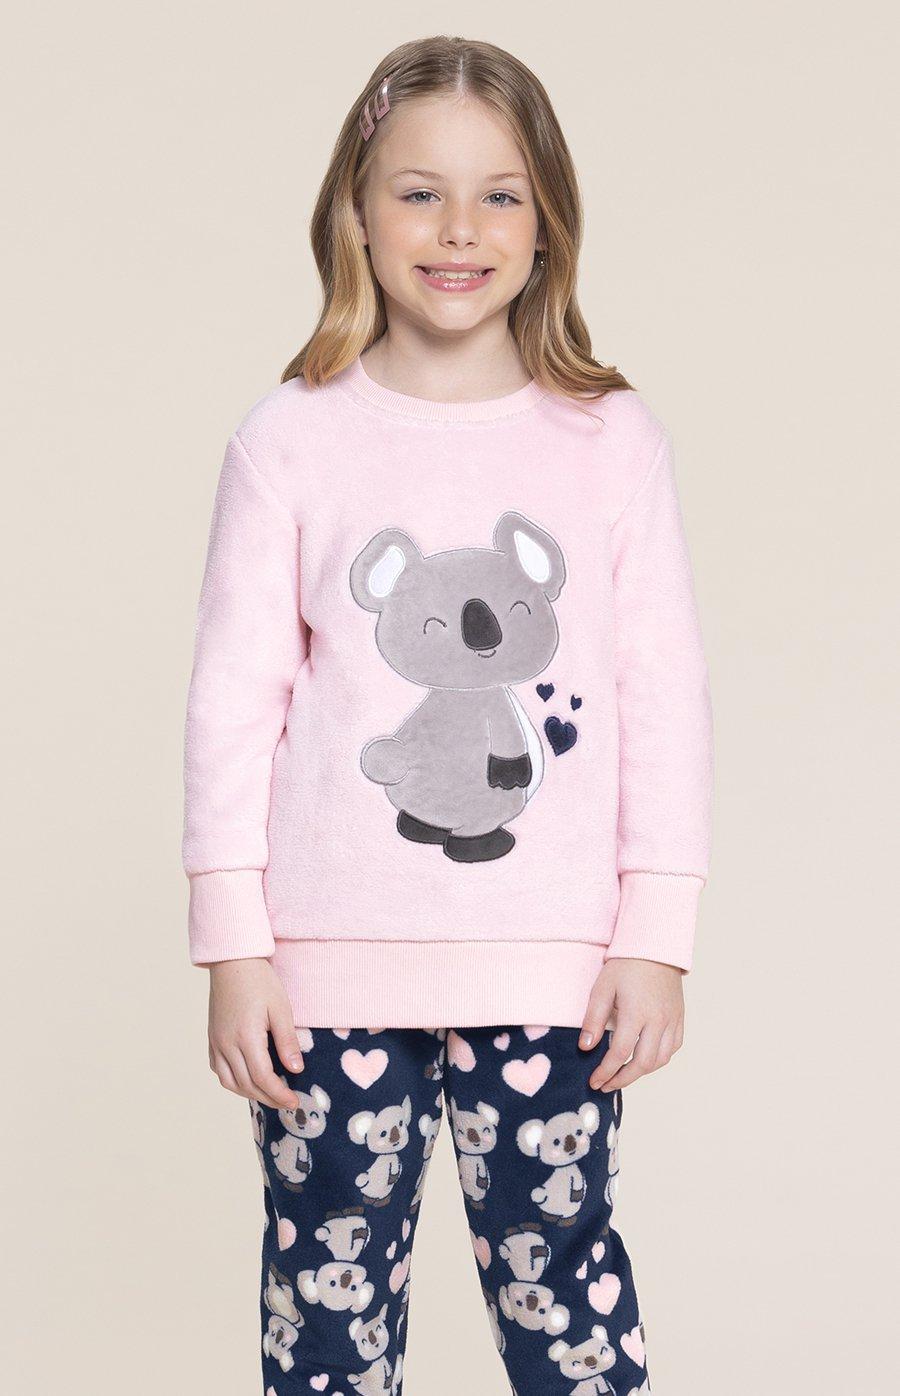 Pijama Infantil Soft Coala Amoreco Inverno 2020 SWEET STORIES